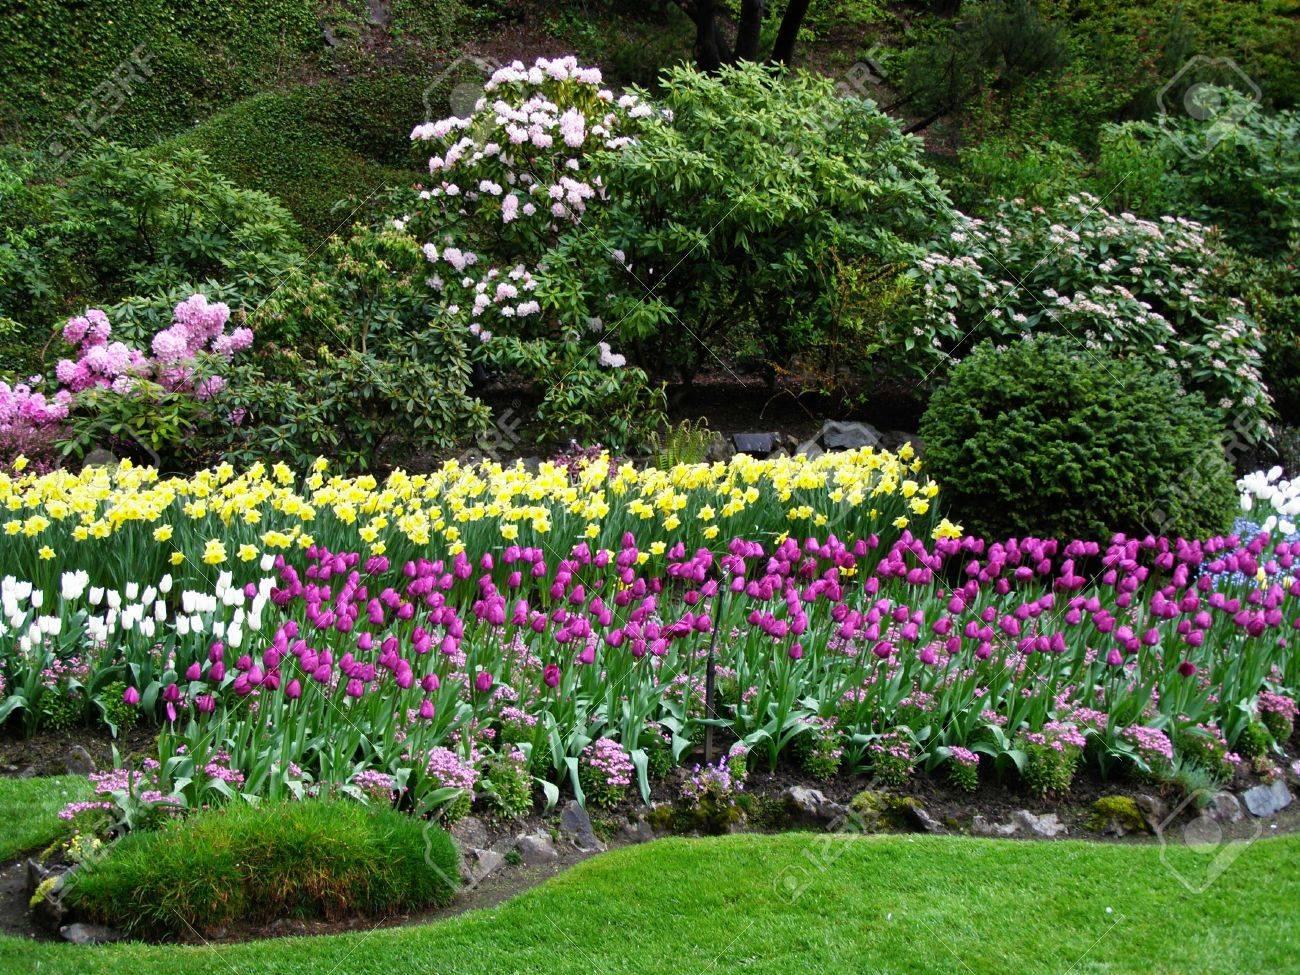 Spring in butchart gardens victoria canada stock photo picture spring in butchart gardens victoria canada stock photo 2659314 altavistaventures Choice Image